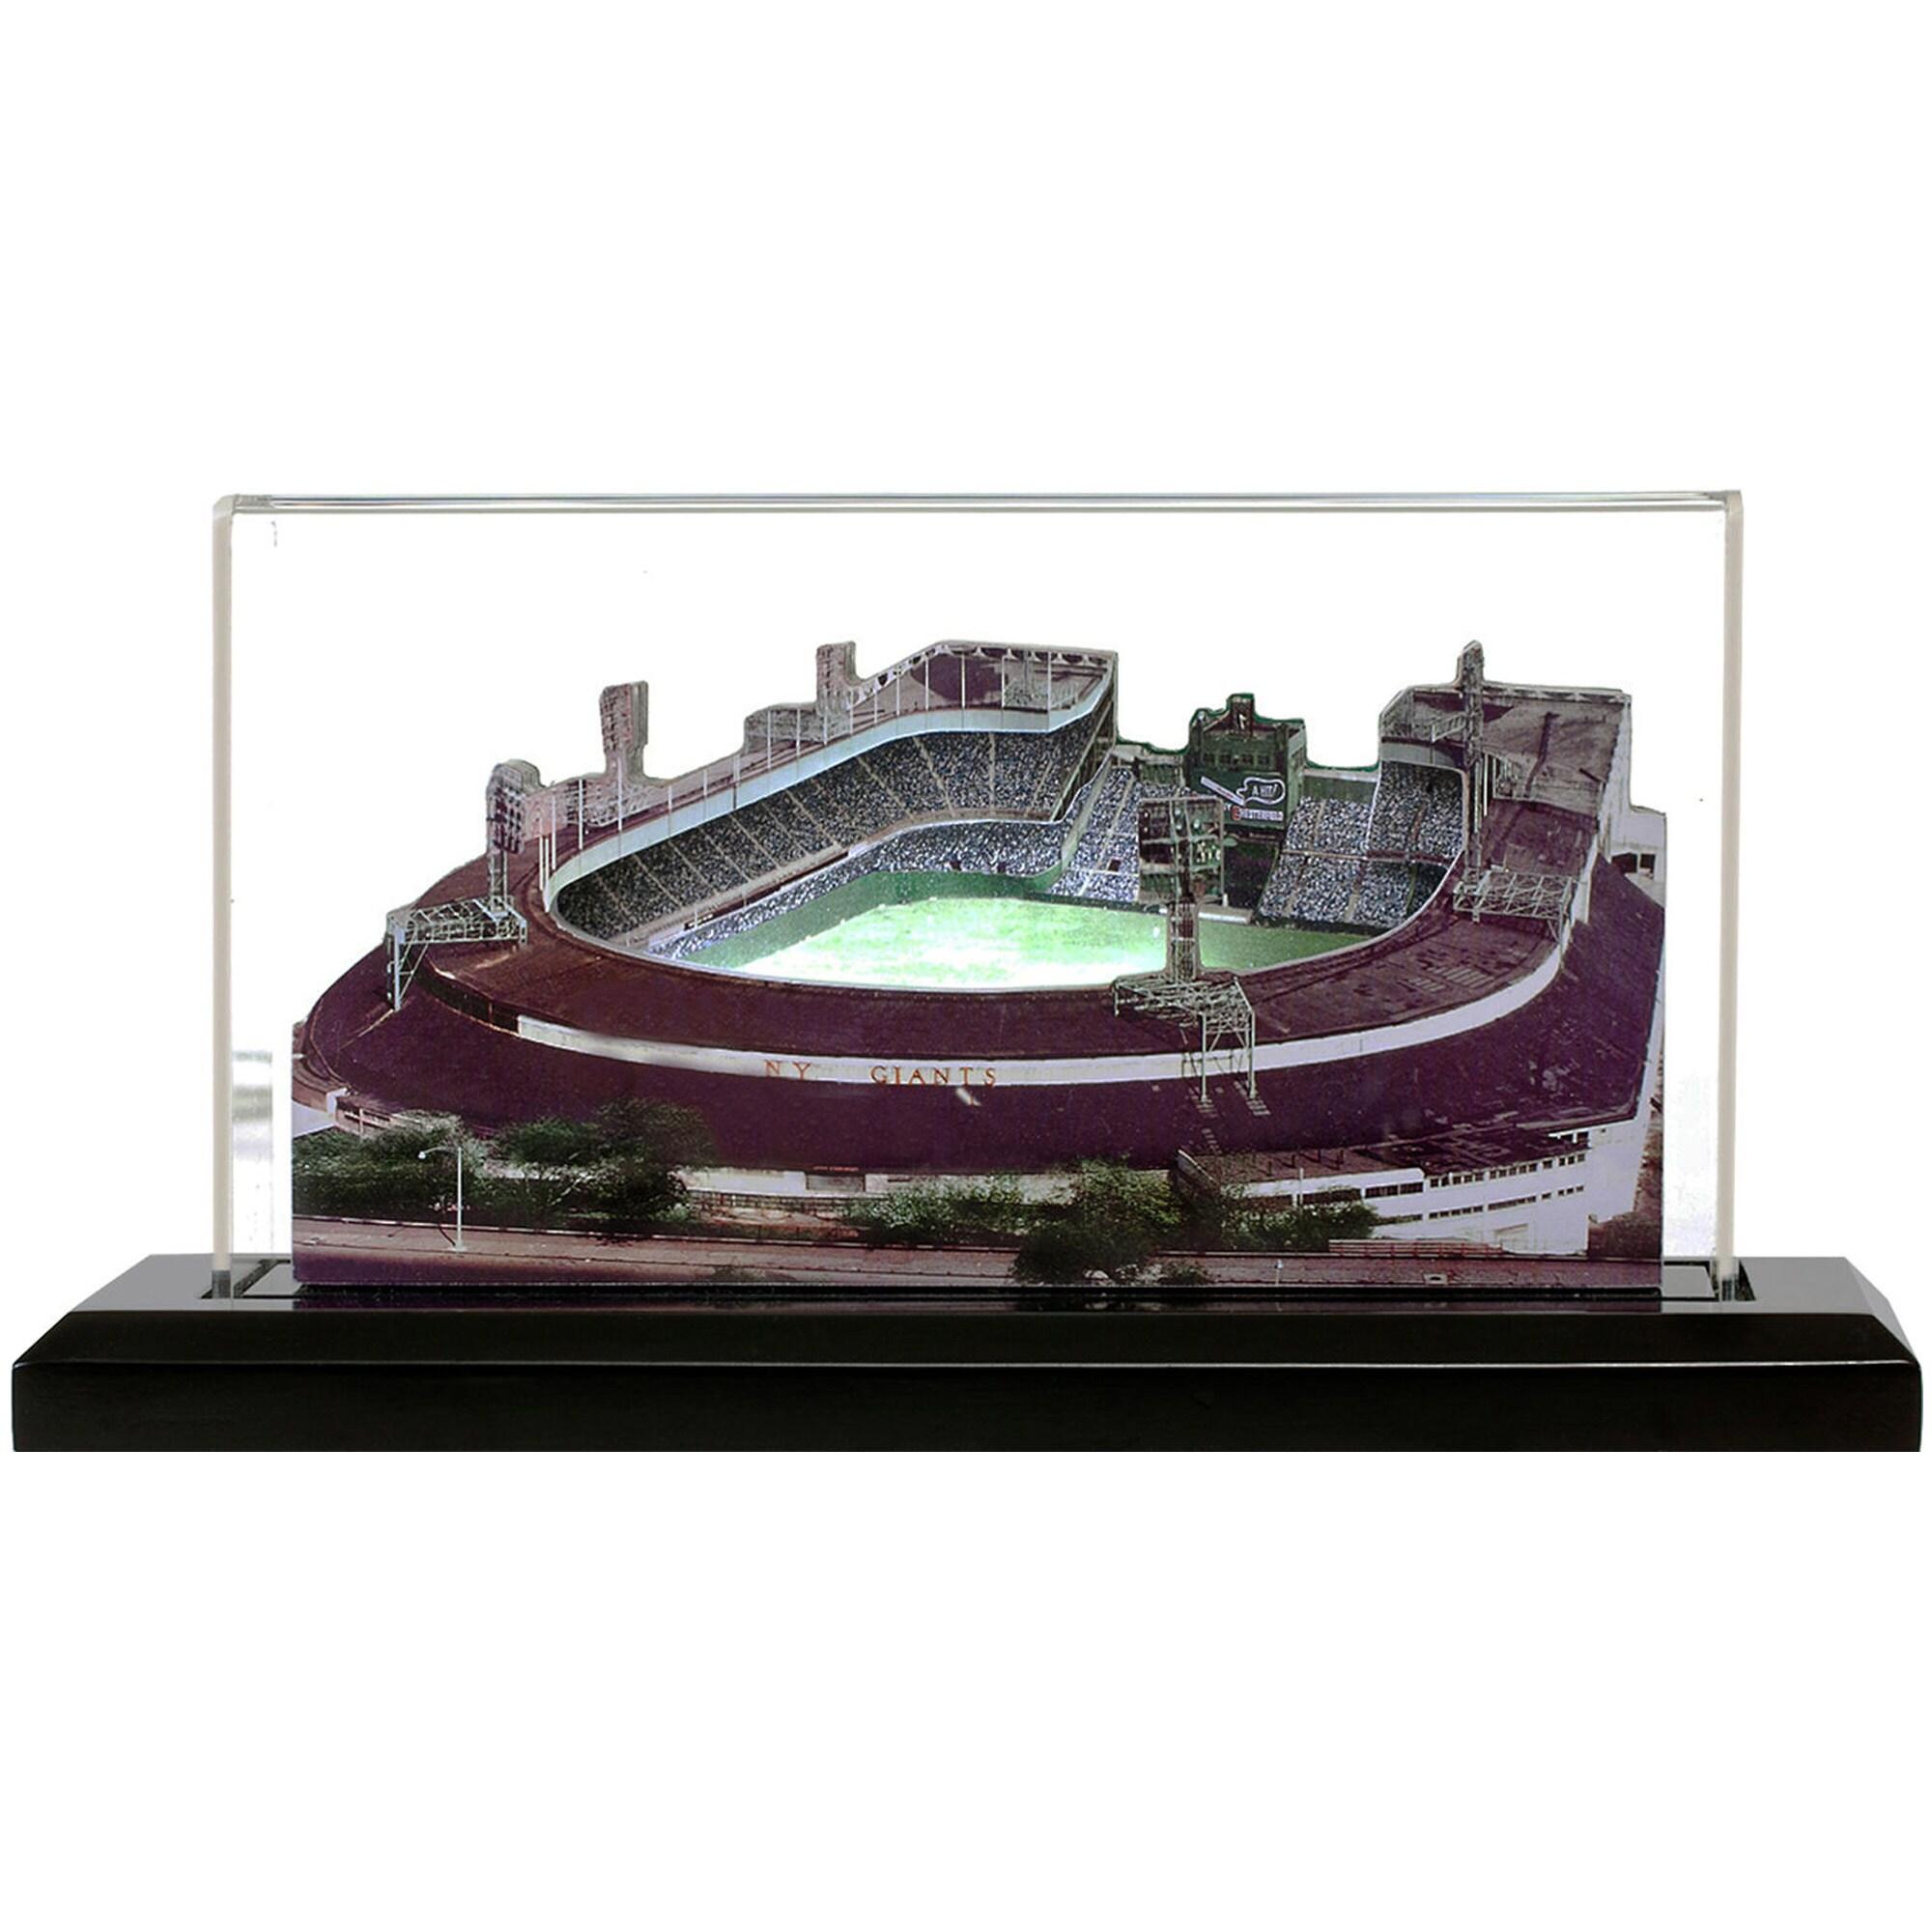 "New York Giants 19"" x 9"" Polo Grounds Light Up Replica Ballpark"